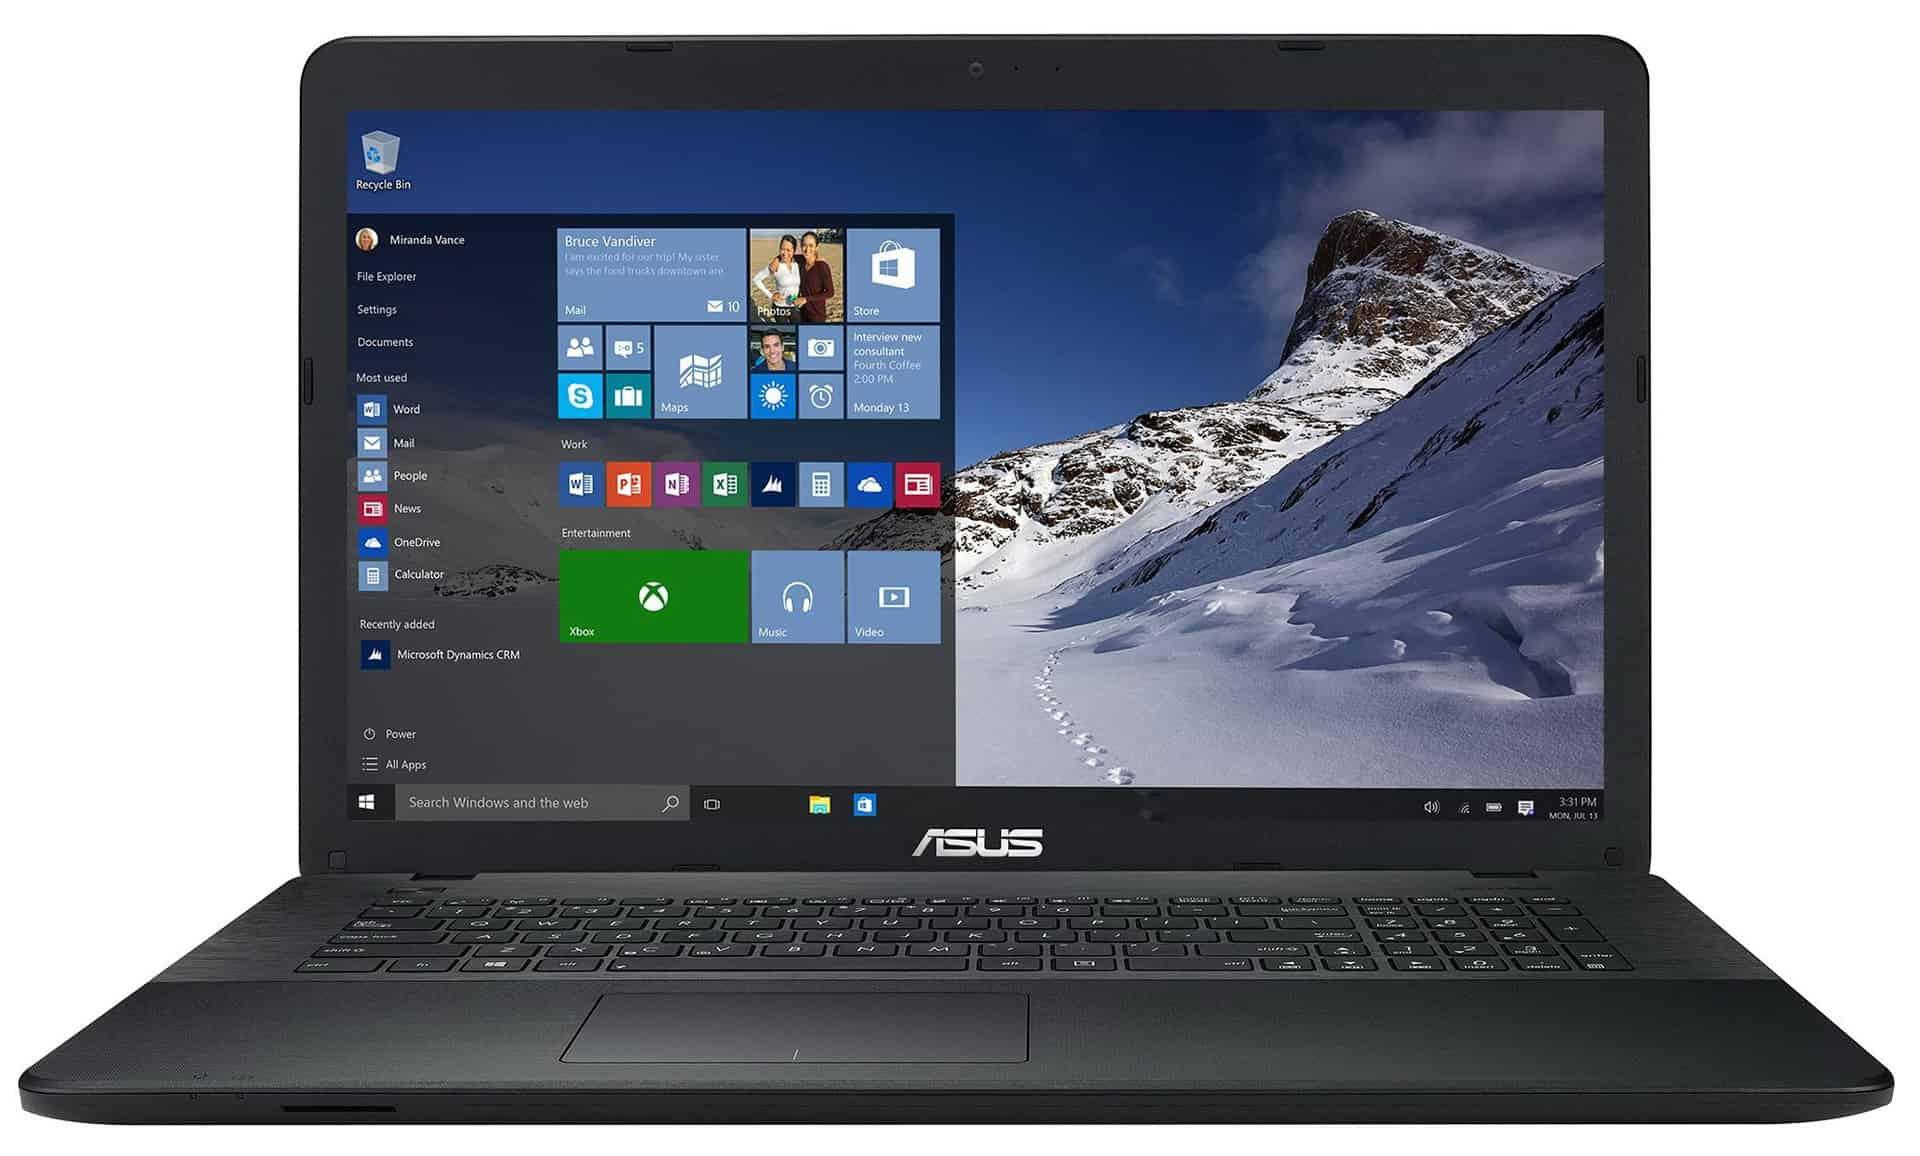 ASUS X751LB-TY151T - laptop elegant de 17,3 inch cu performanta mare!